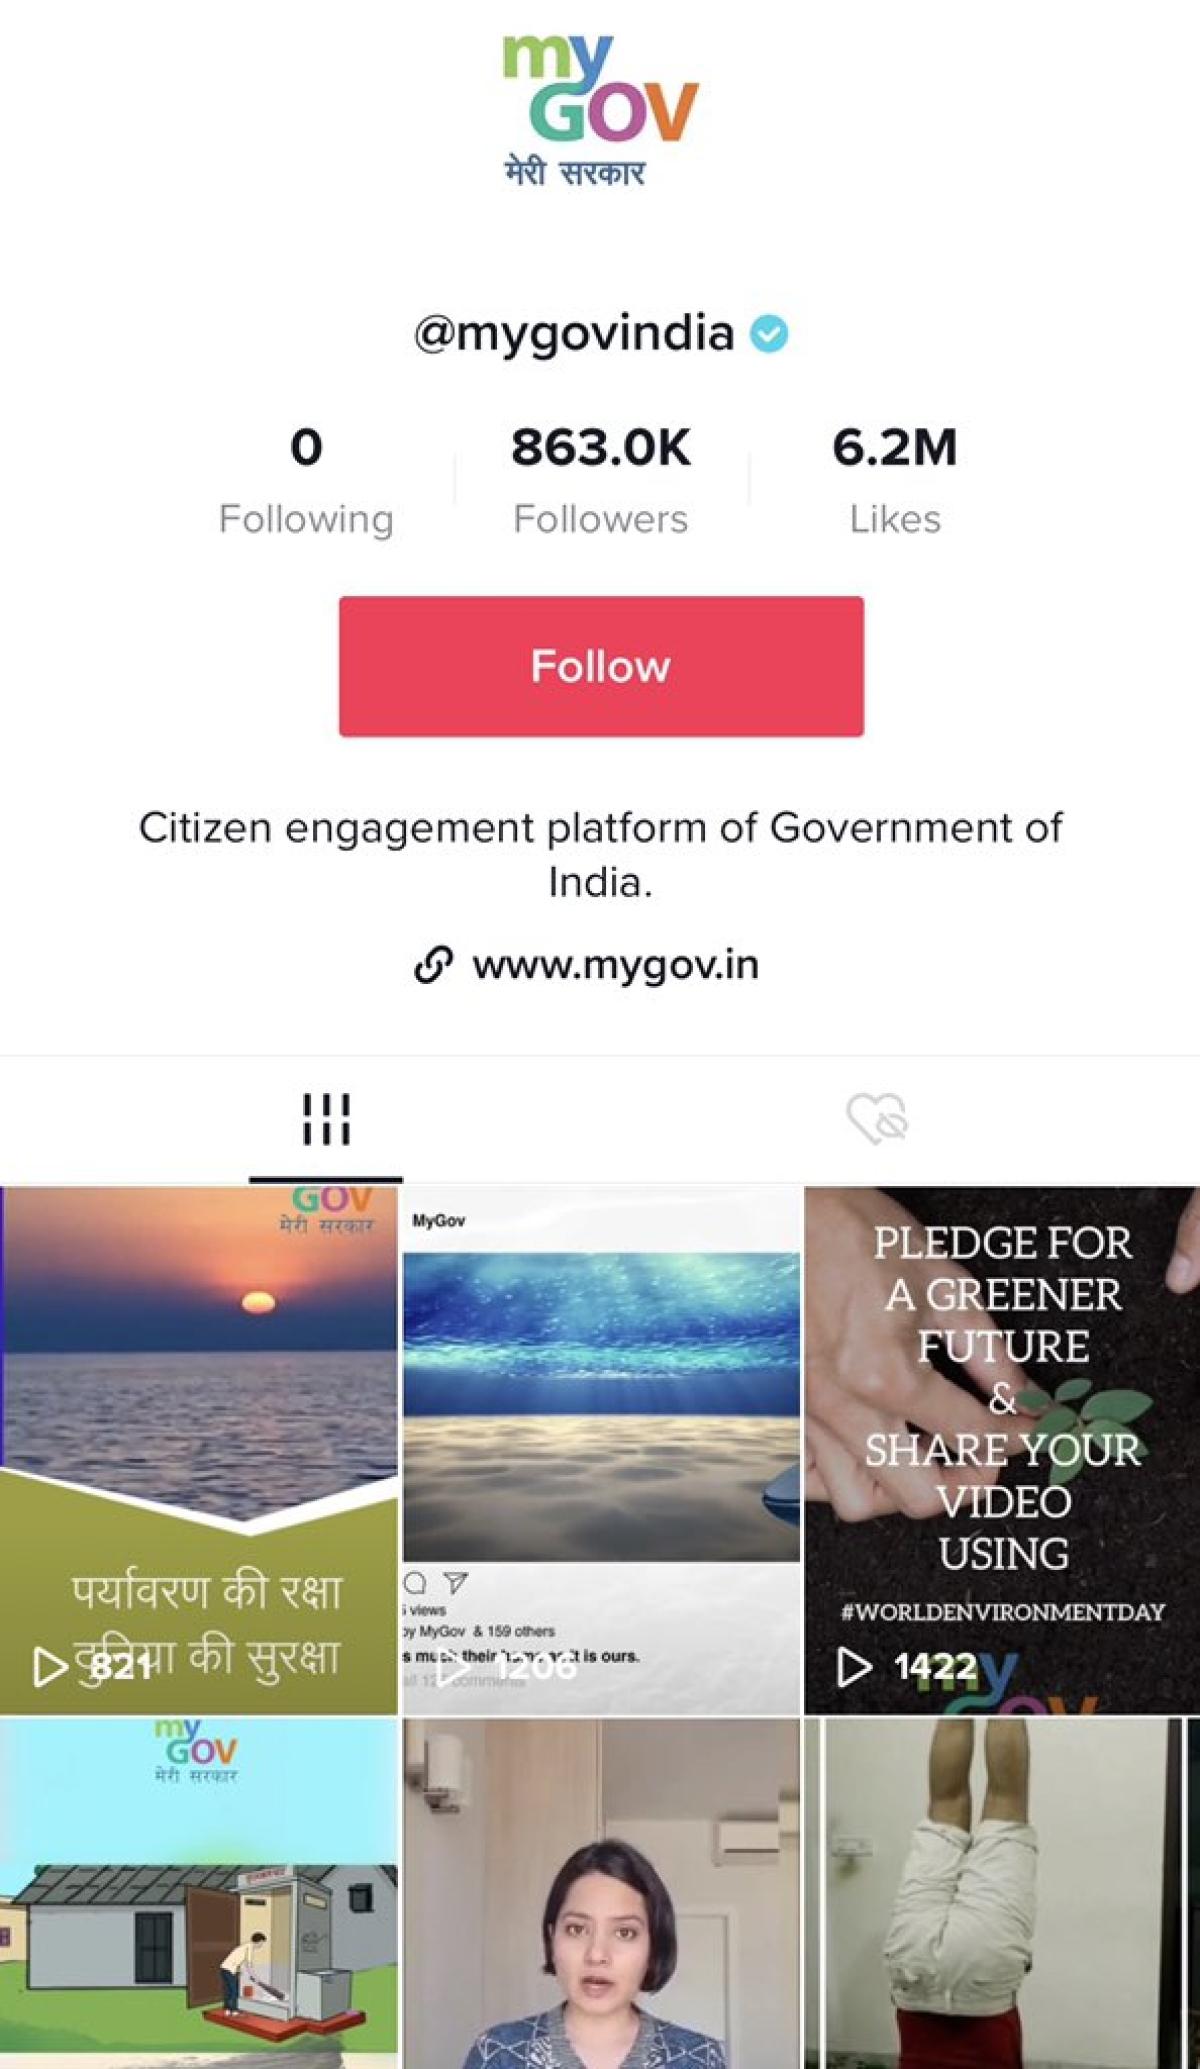 Banning Chinese apps? The latest Virat Kohli video looks like it was made on TikTok